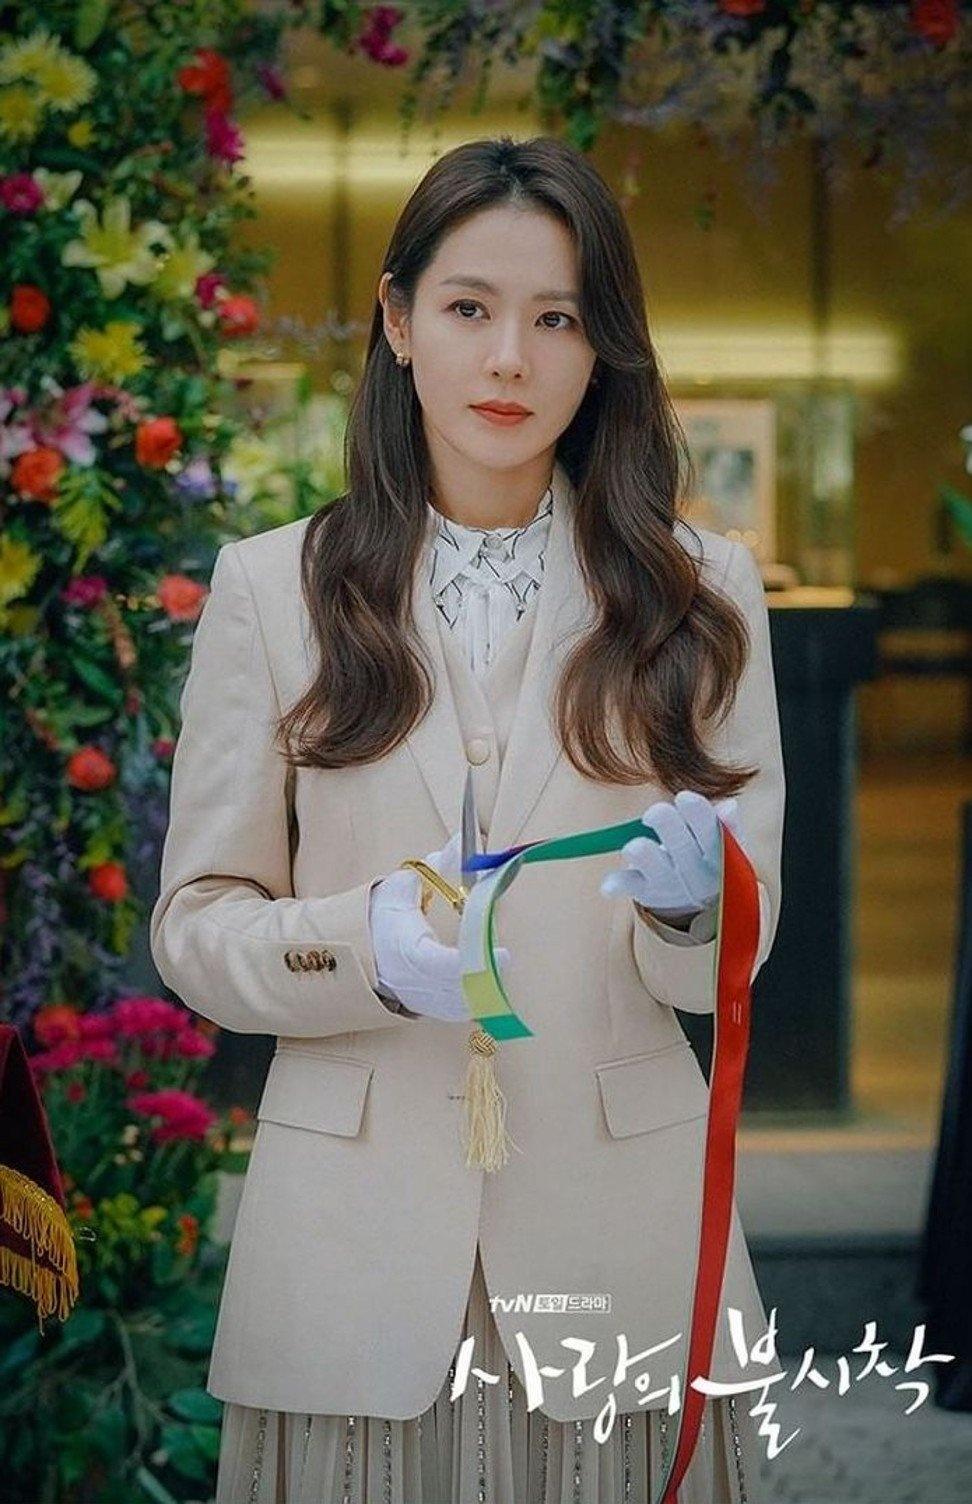 Loat do hieu gia nghin USD cua Son Ye Jin trong phim 'Ha canh noi anh' hinh anh 8 son6.jpg